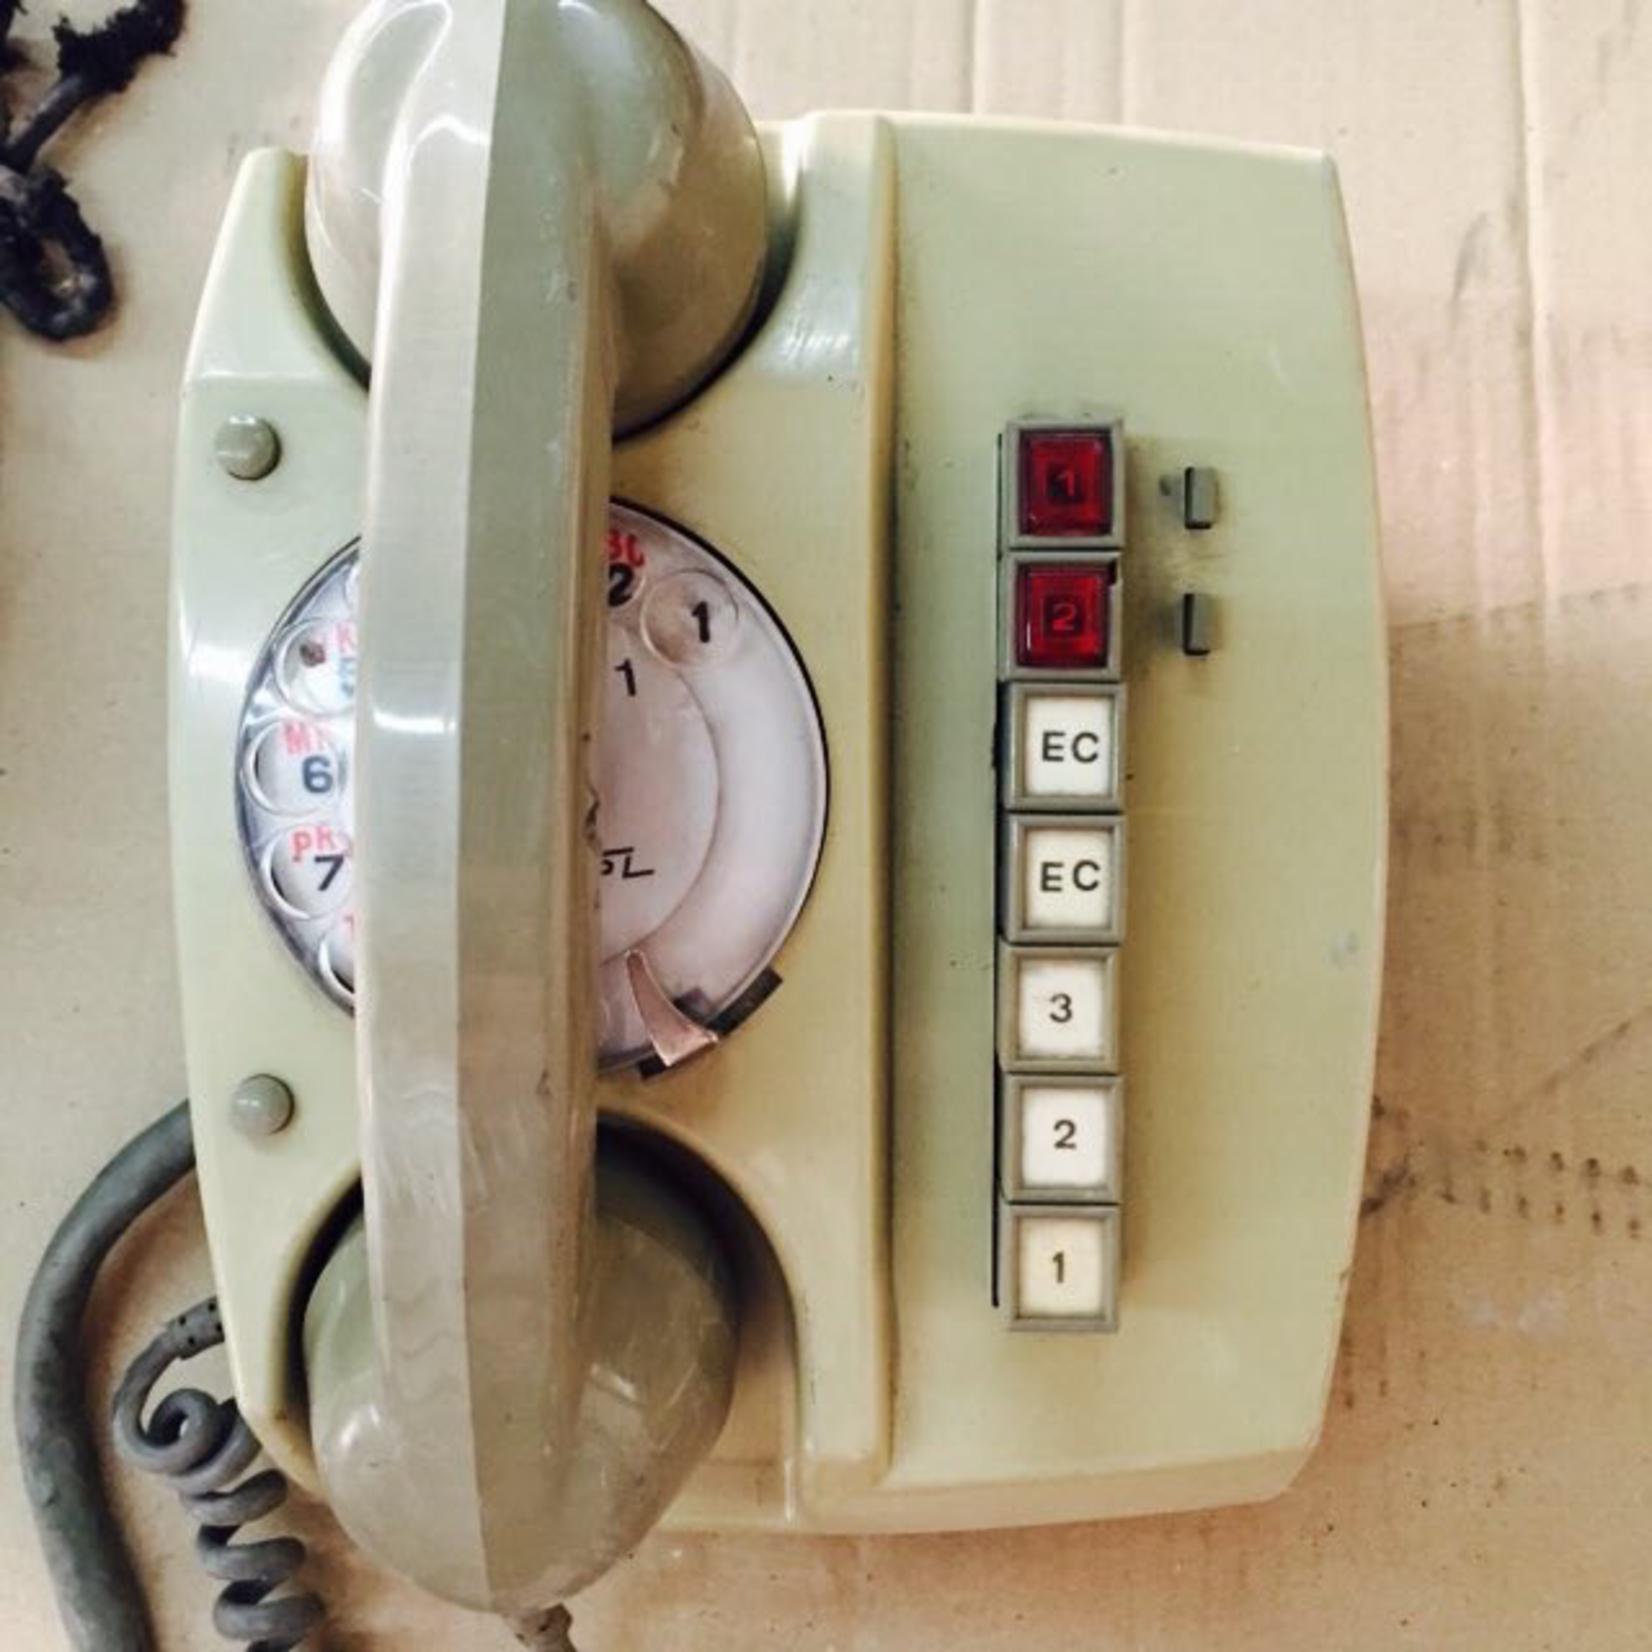 TAJHOME VINTAGE WHITE PHONE